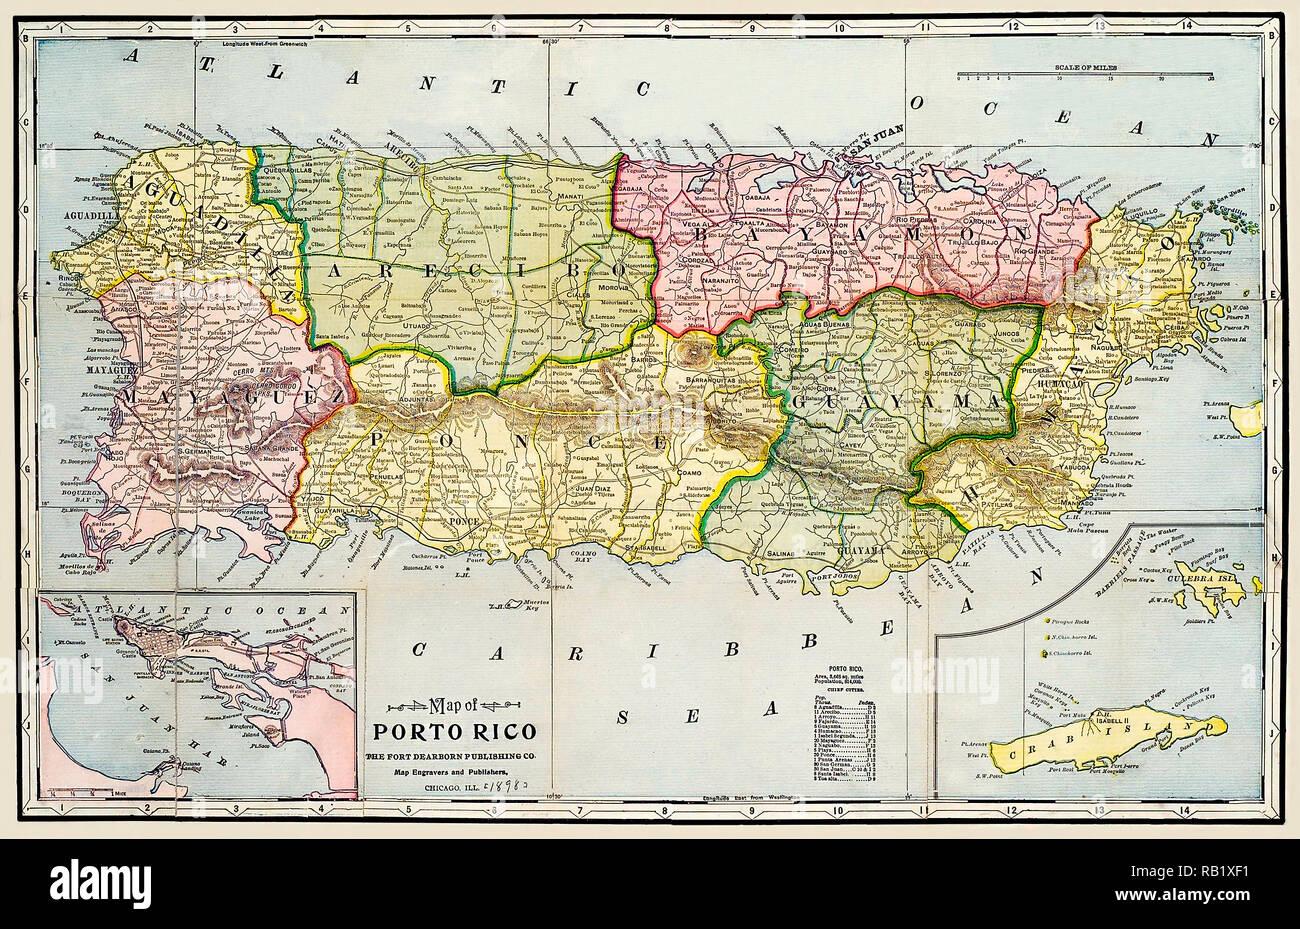 Map of Porto Rico [Puerto Rico] 1895 - Stock Image